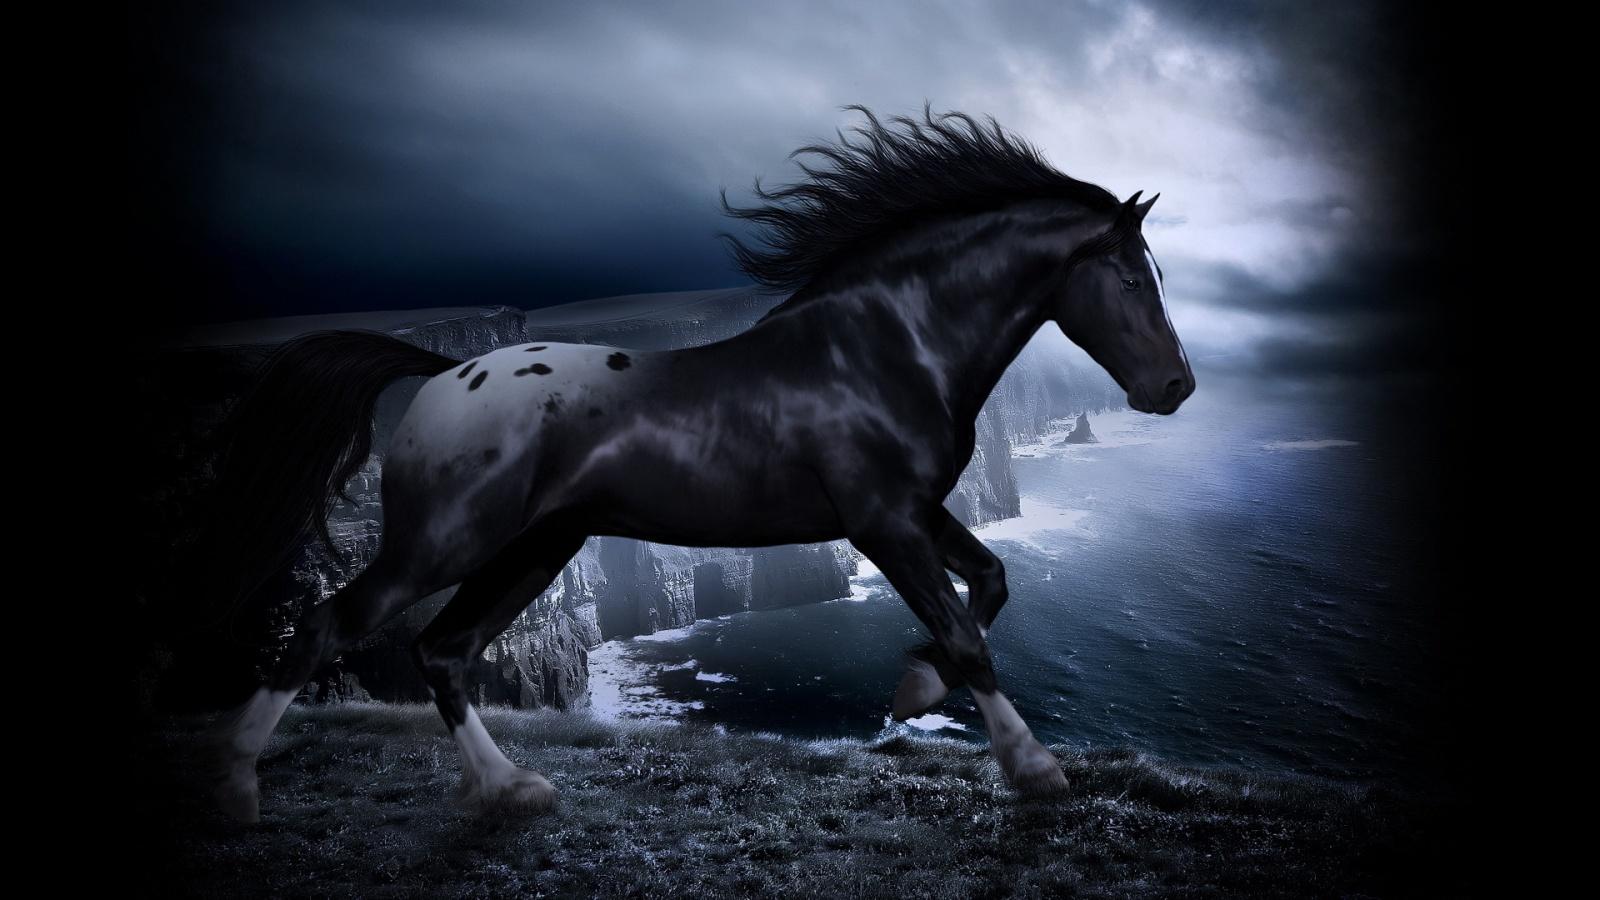 72 Horse Pictures For Desktop Background On Wallpapersafari